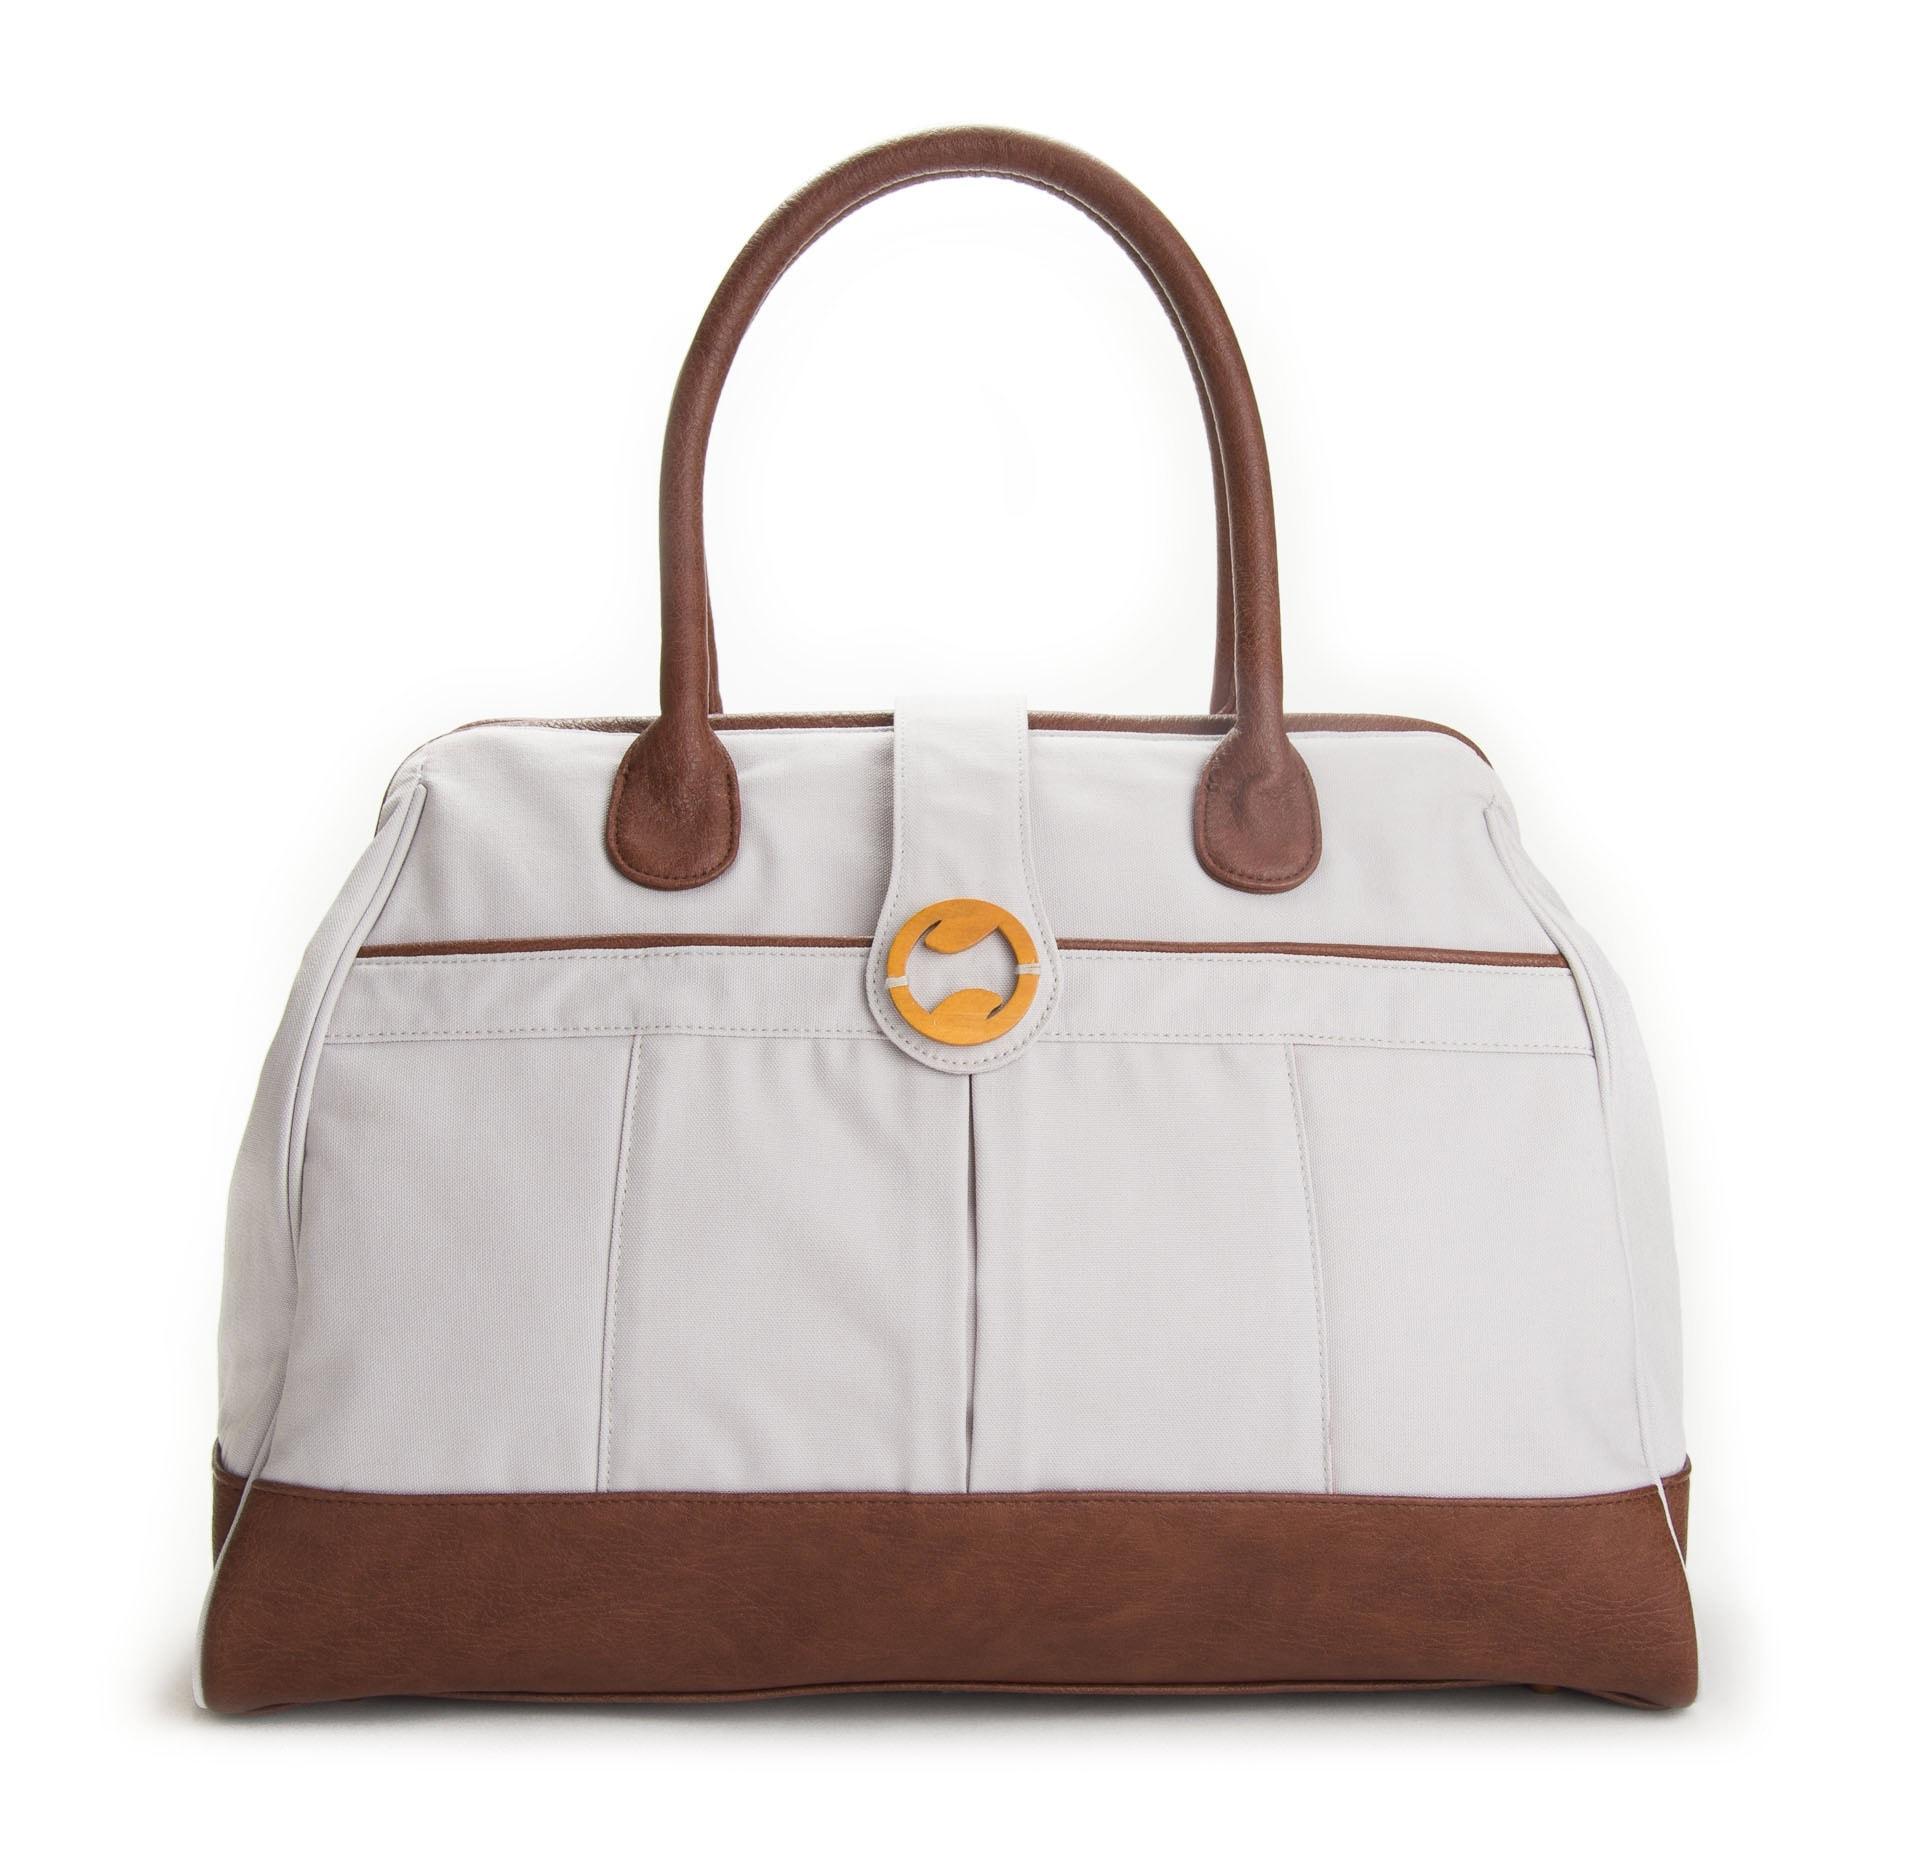 Canvas Weekender Bag | Gym Bag & Yoga Bag for Women | Weekend Bag